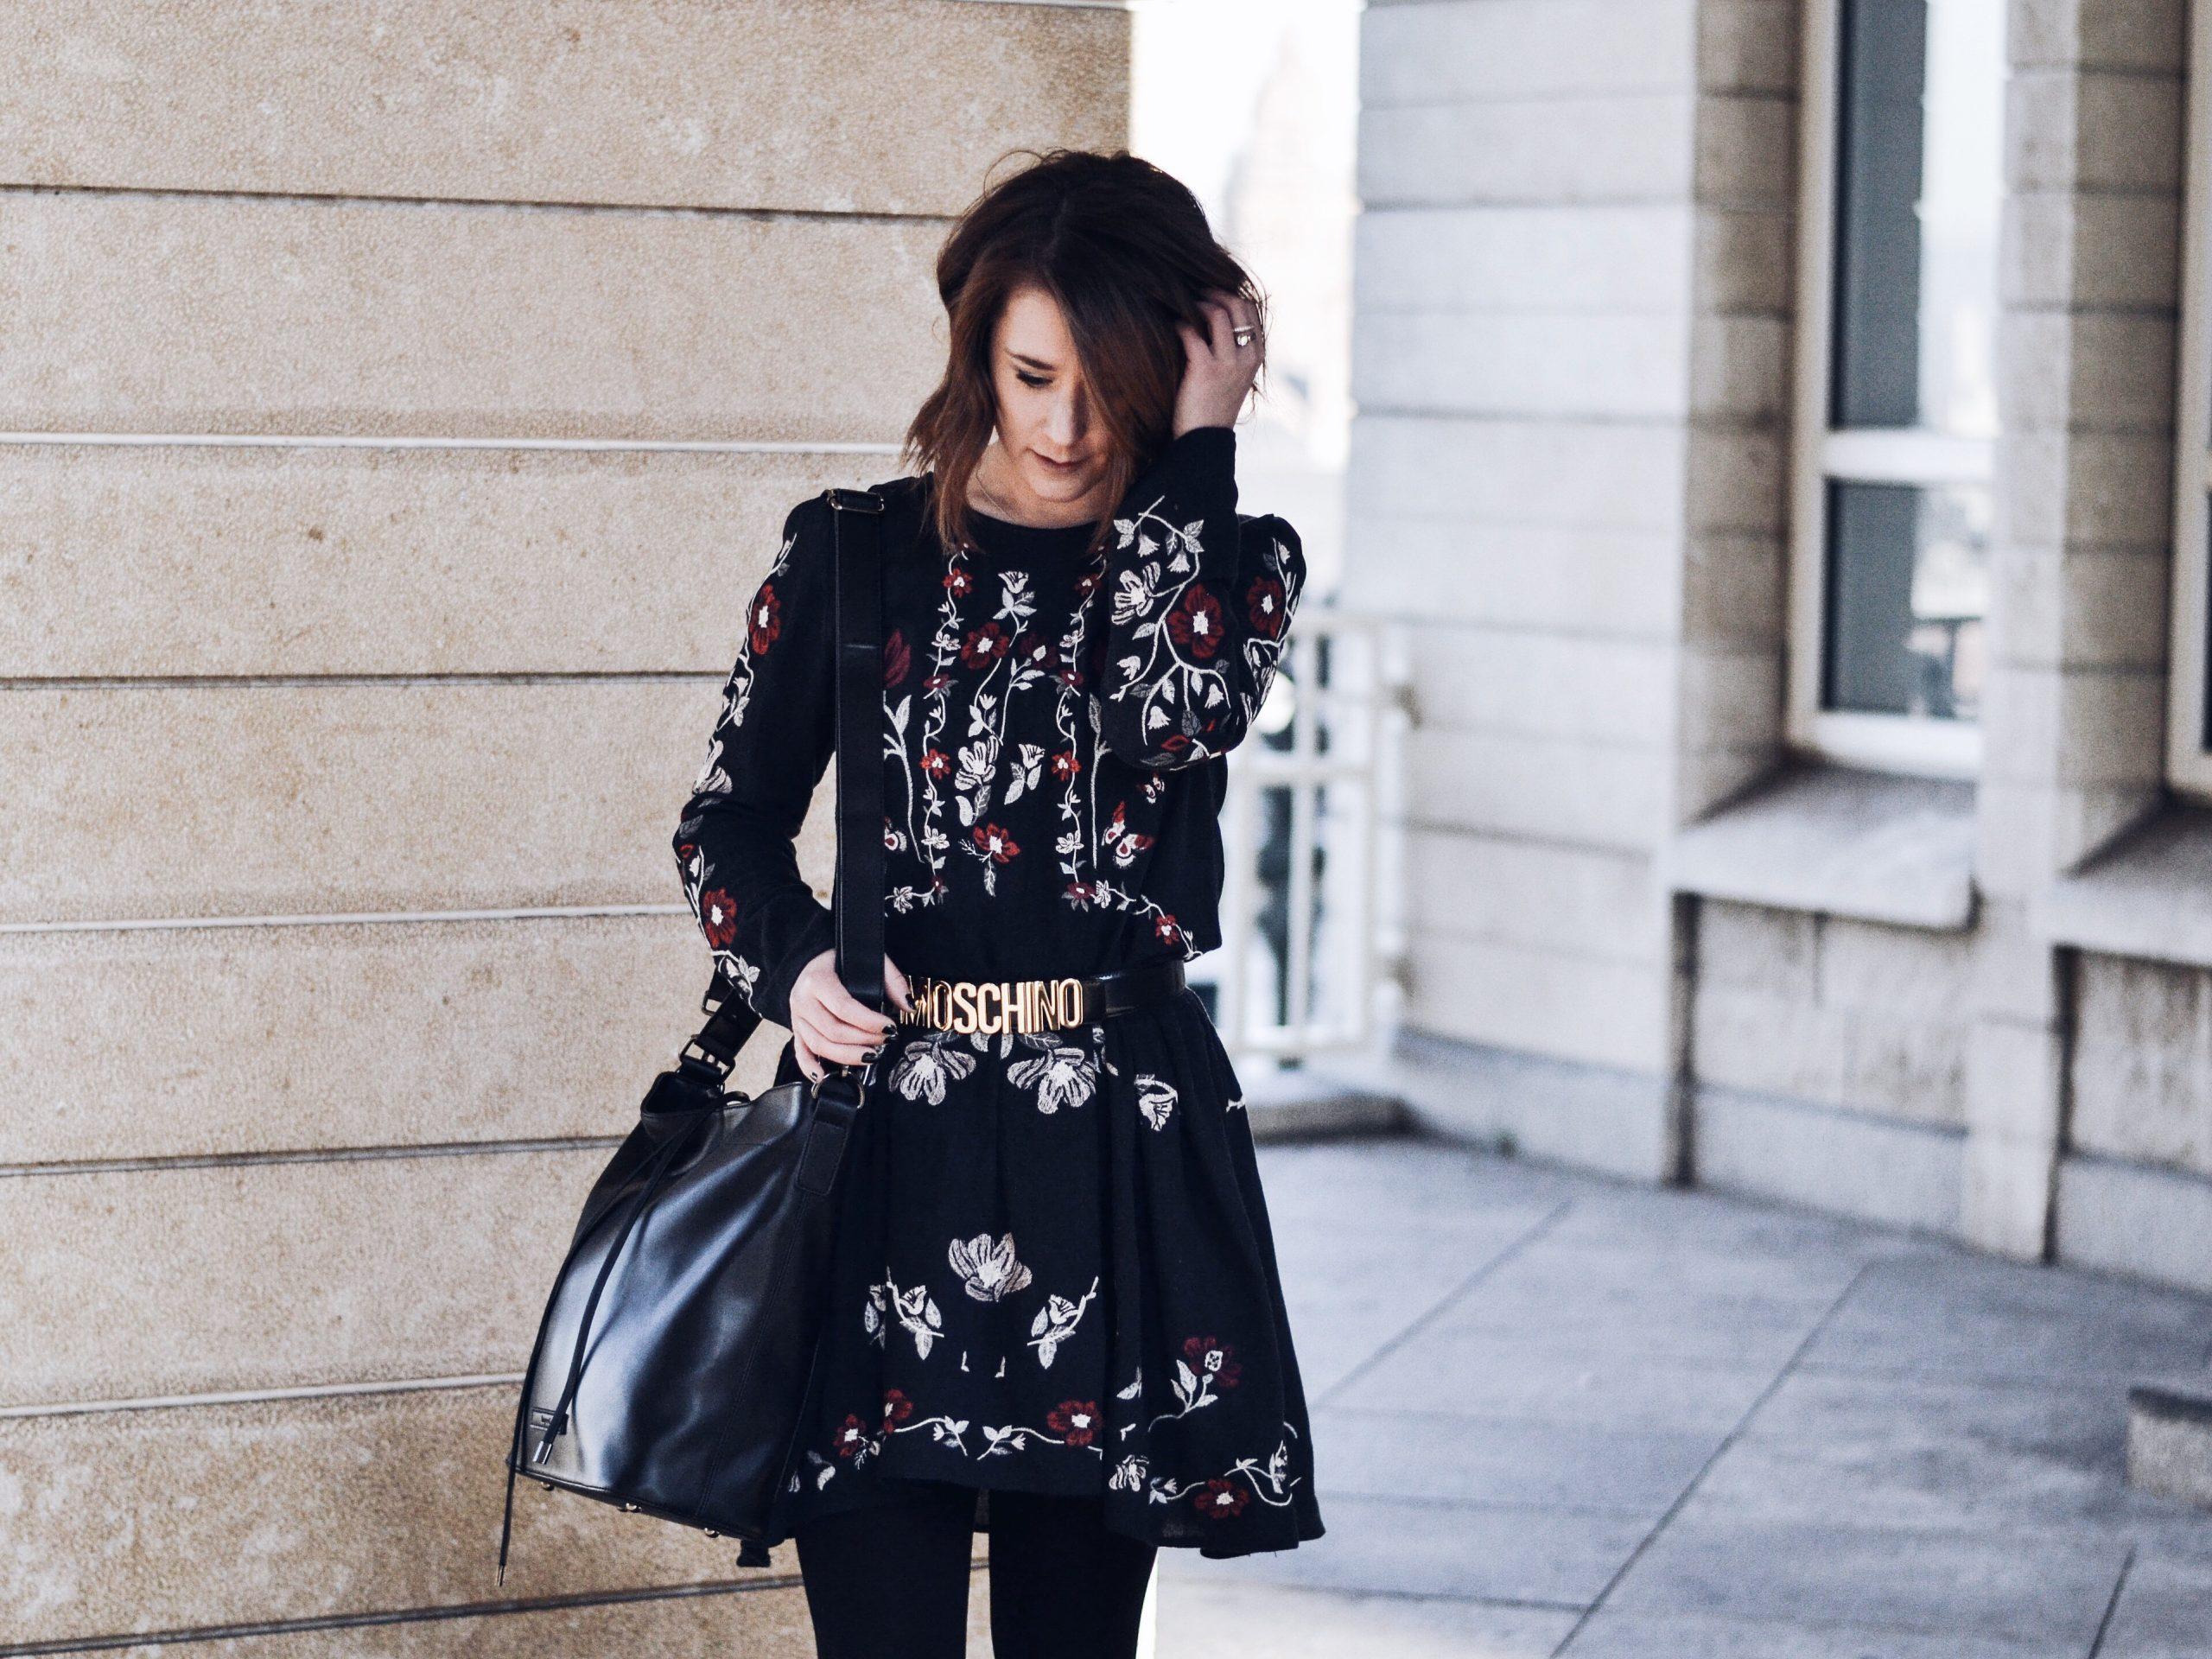 Bordeaux Kleid Zara  Abendkleider Beliebte Modelle